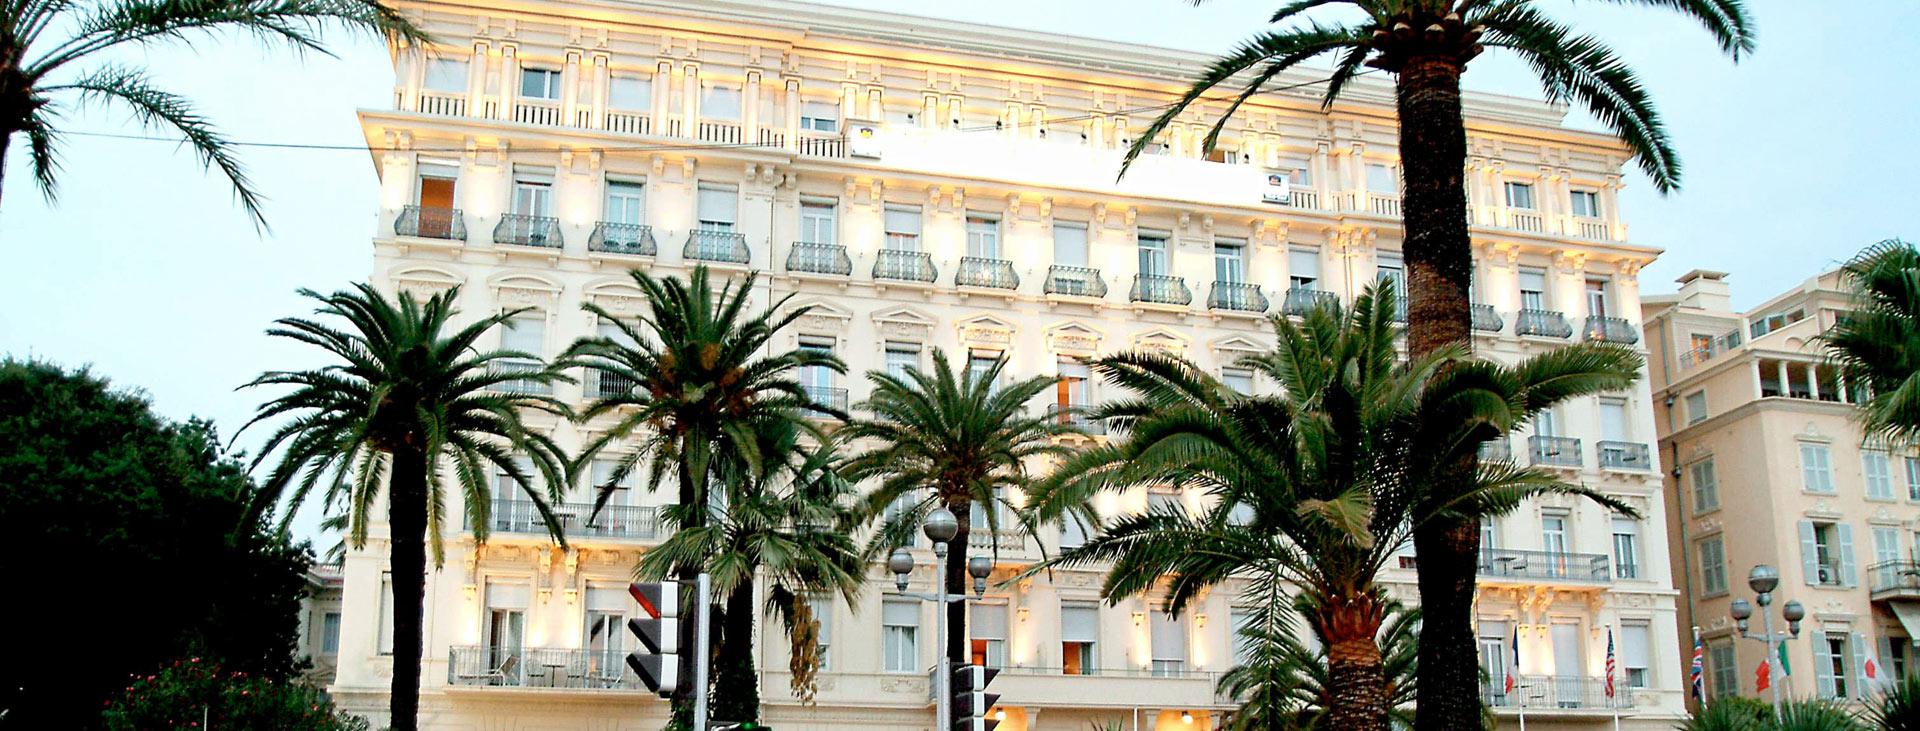 West End, Nizza, Ranskan Riviera, Ranska